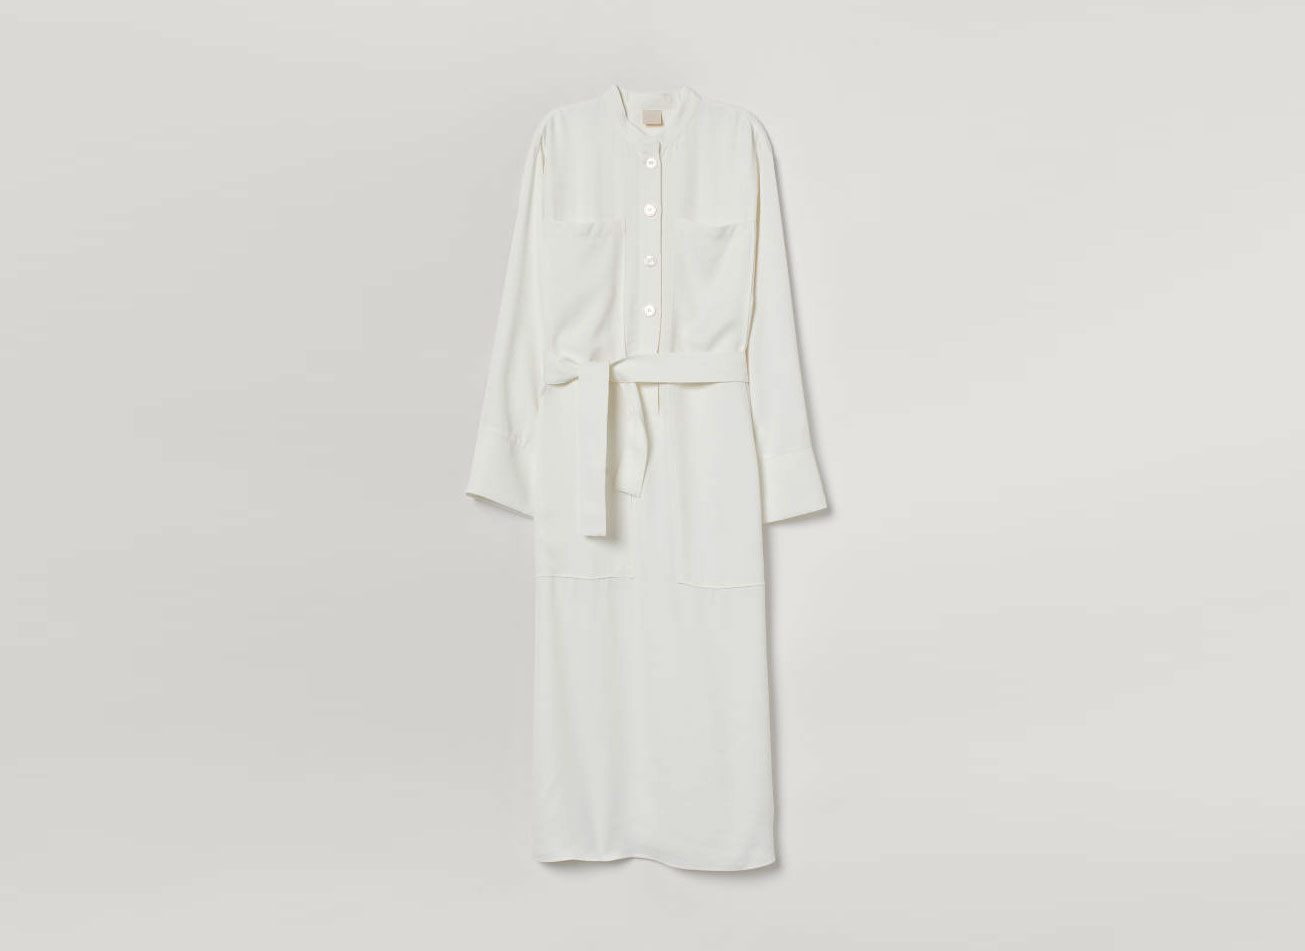 H&M Shirt Dress with Tie Belt